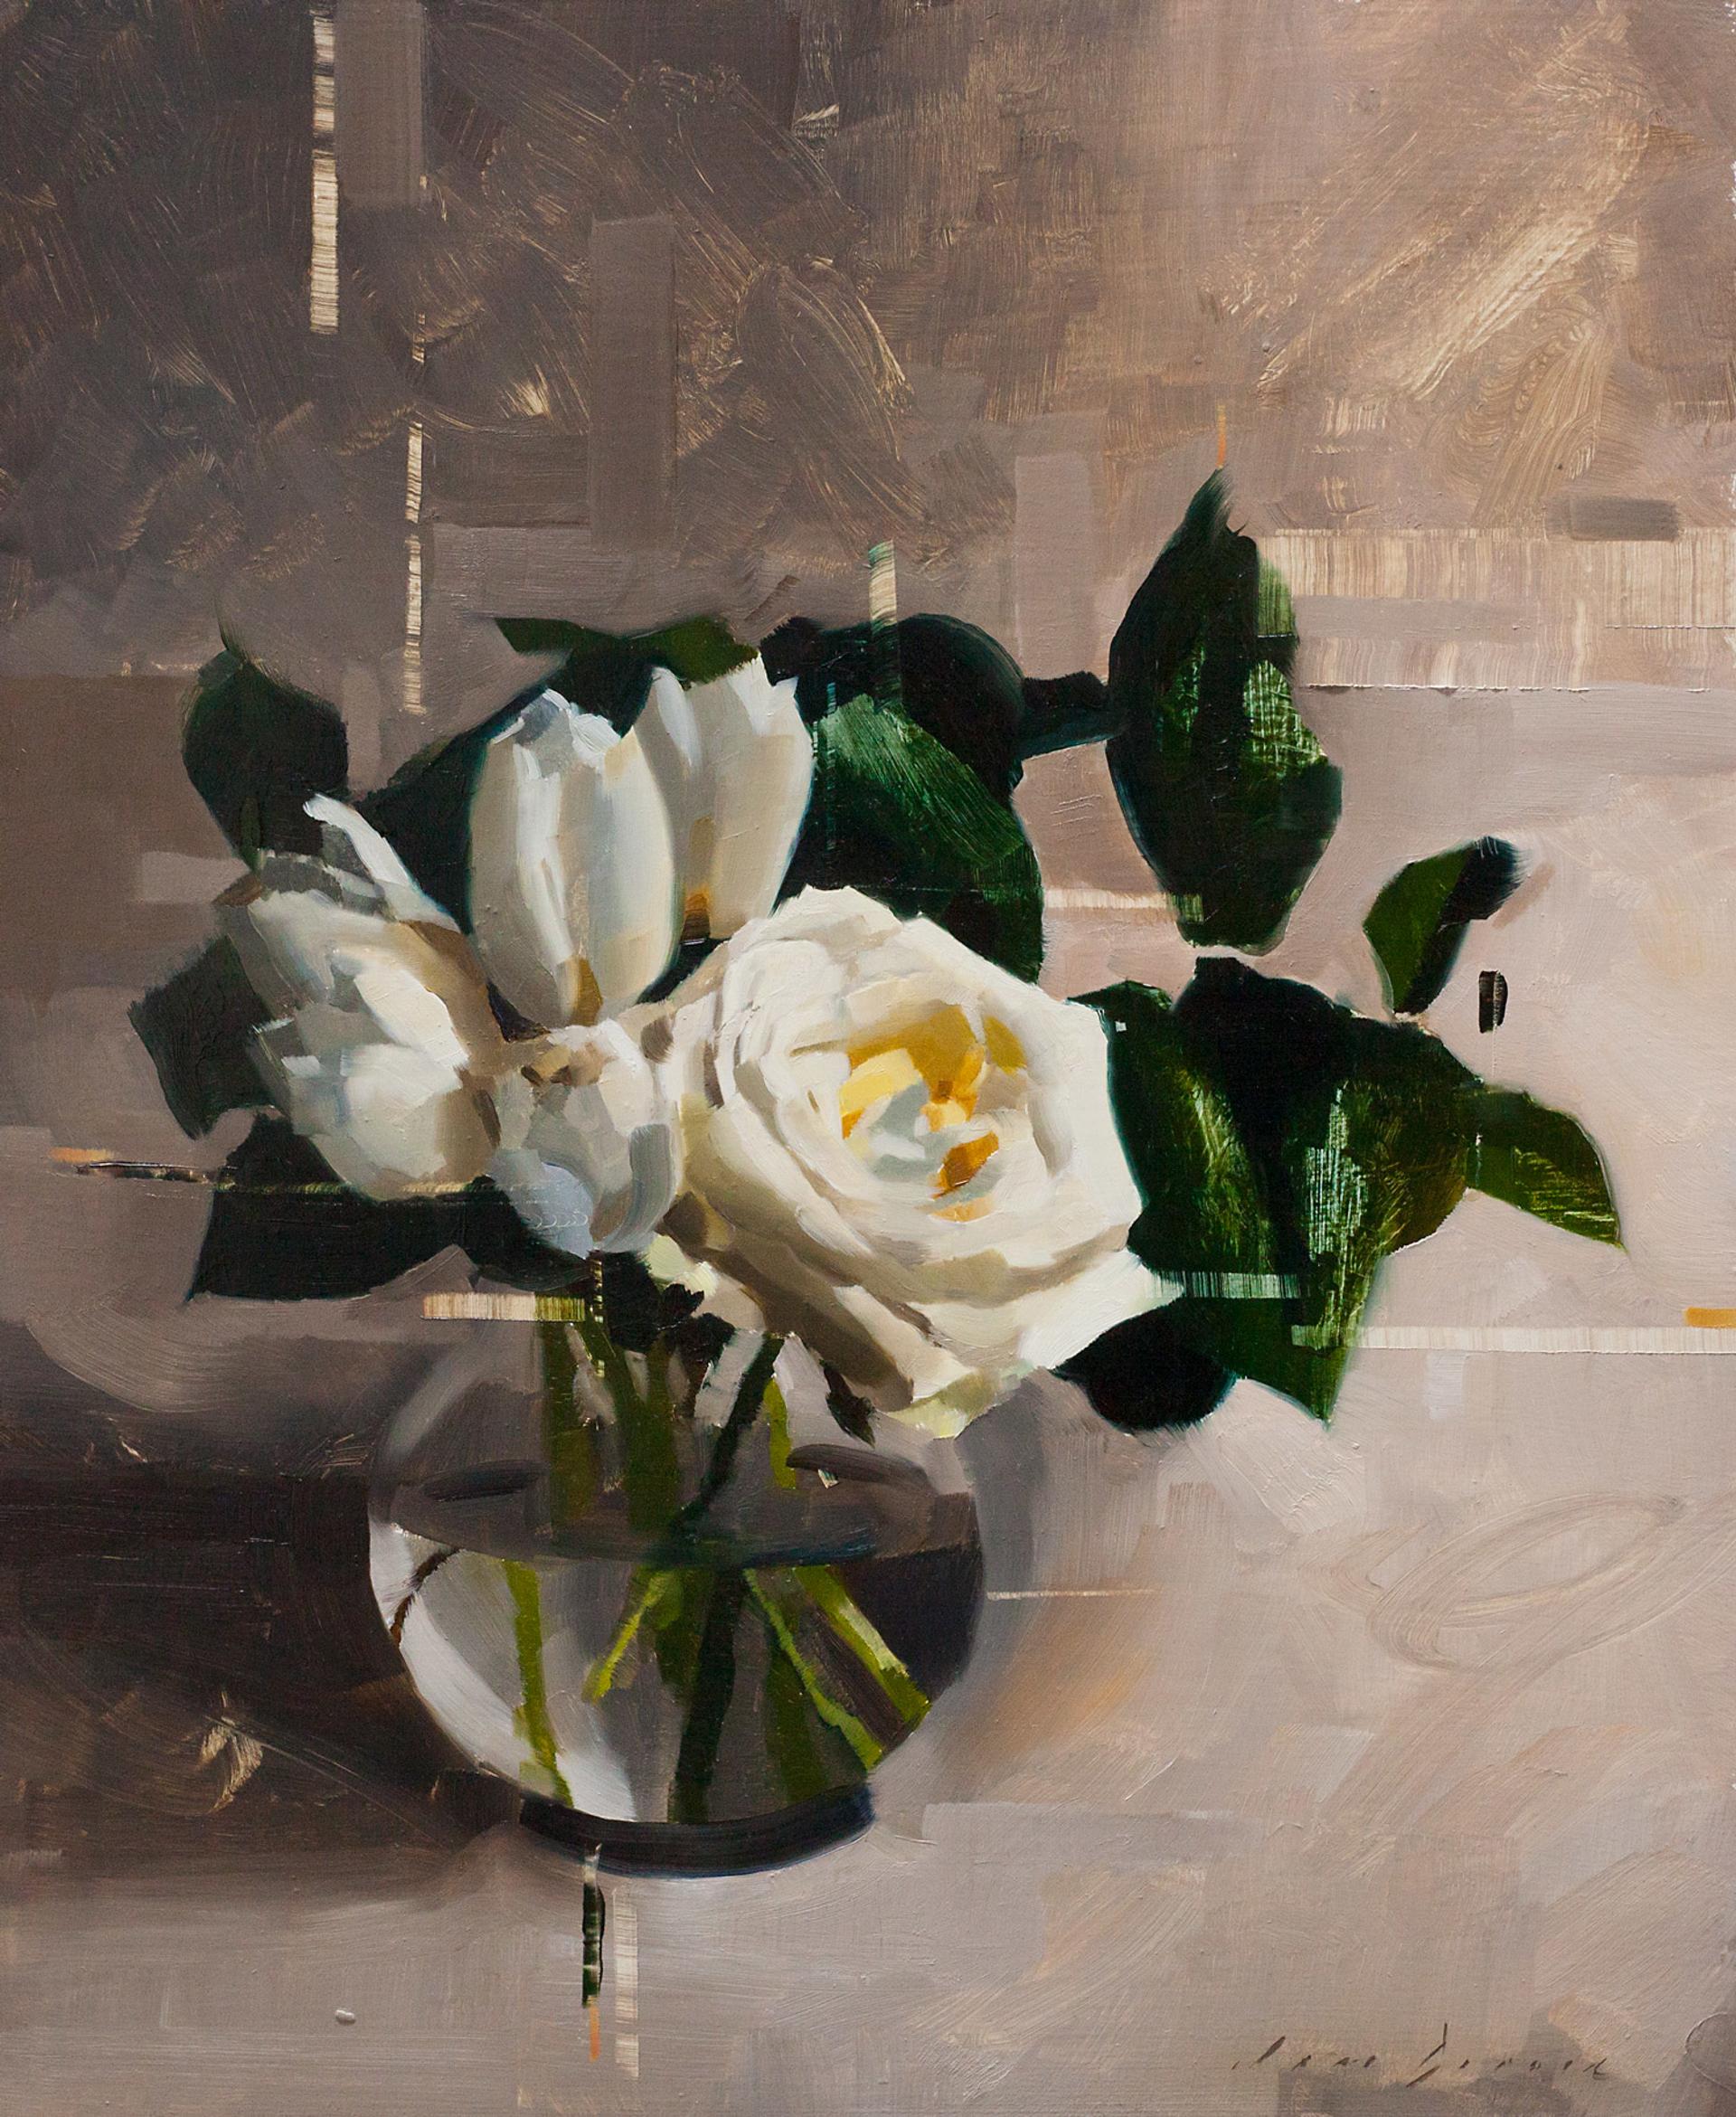 White Rose and Tulips by Jon Doran